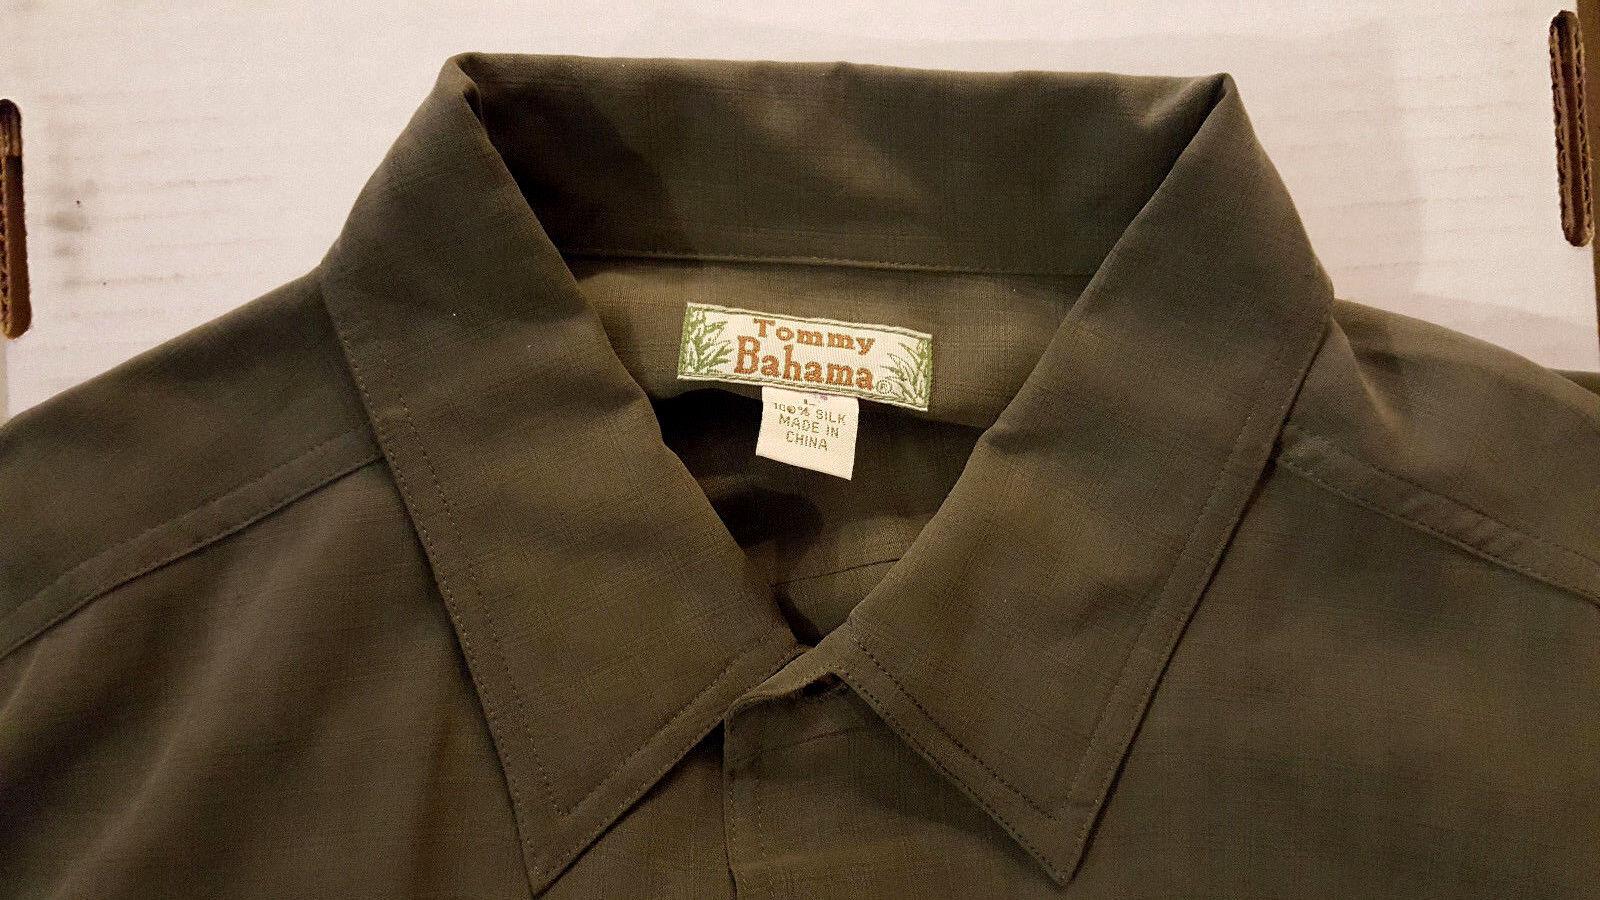 Tommy Bahama Uomo L/Sleeve  Camp shirt Size L L Size Olive verde solid 100% Silk NWOT ce2c20